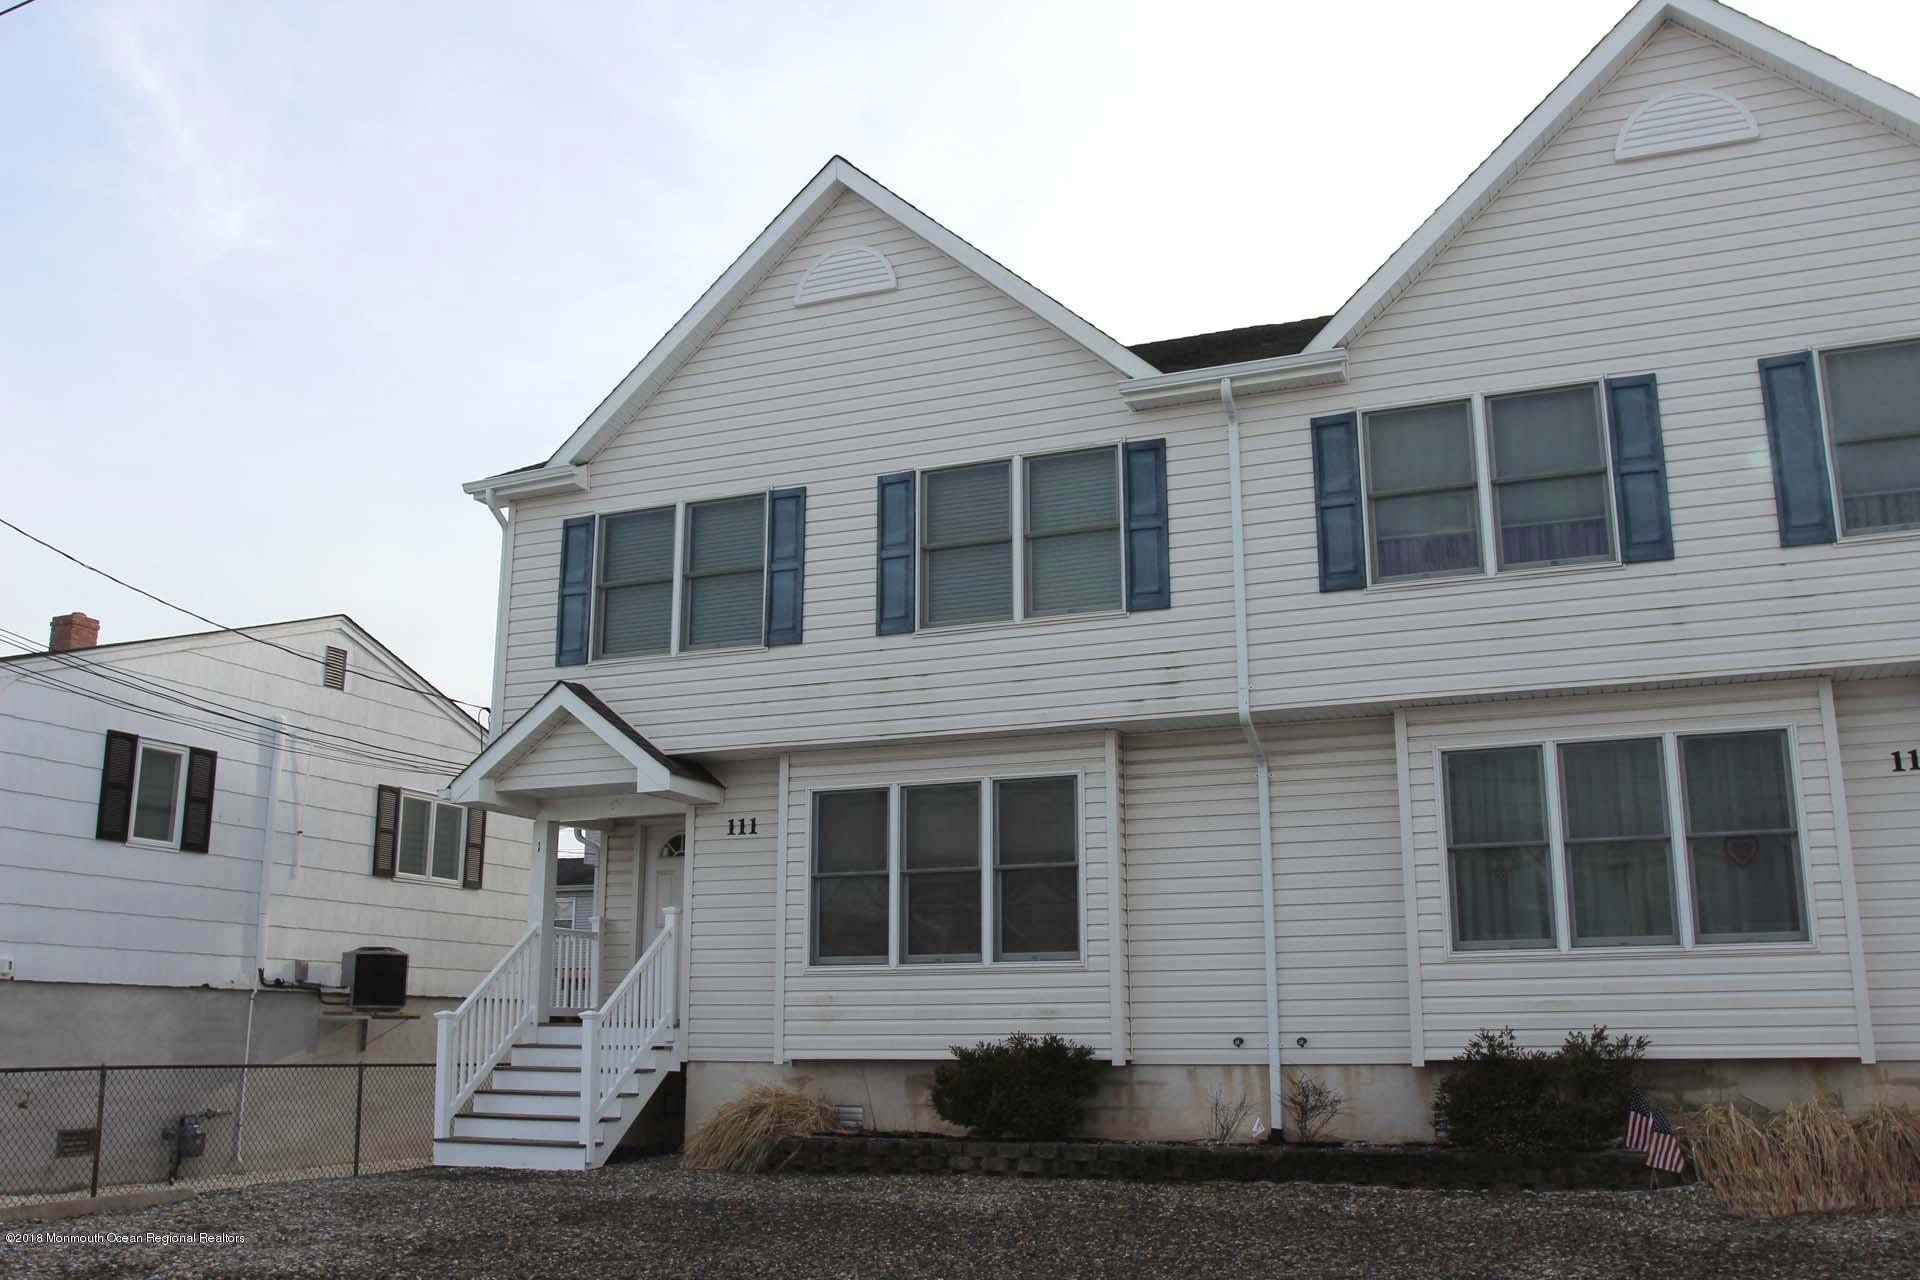 Condominium for Rent at 111 Trinidad Avenue 111 Trinidad Avenue Seaside Heights, New Jersey 08751 United States